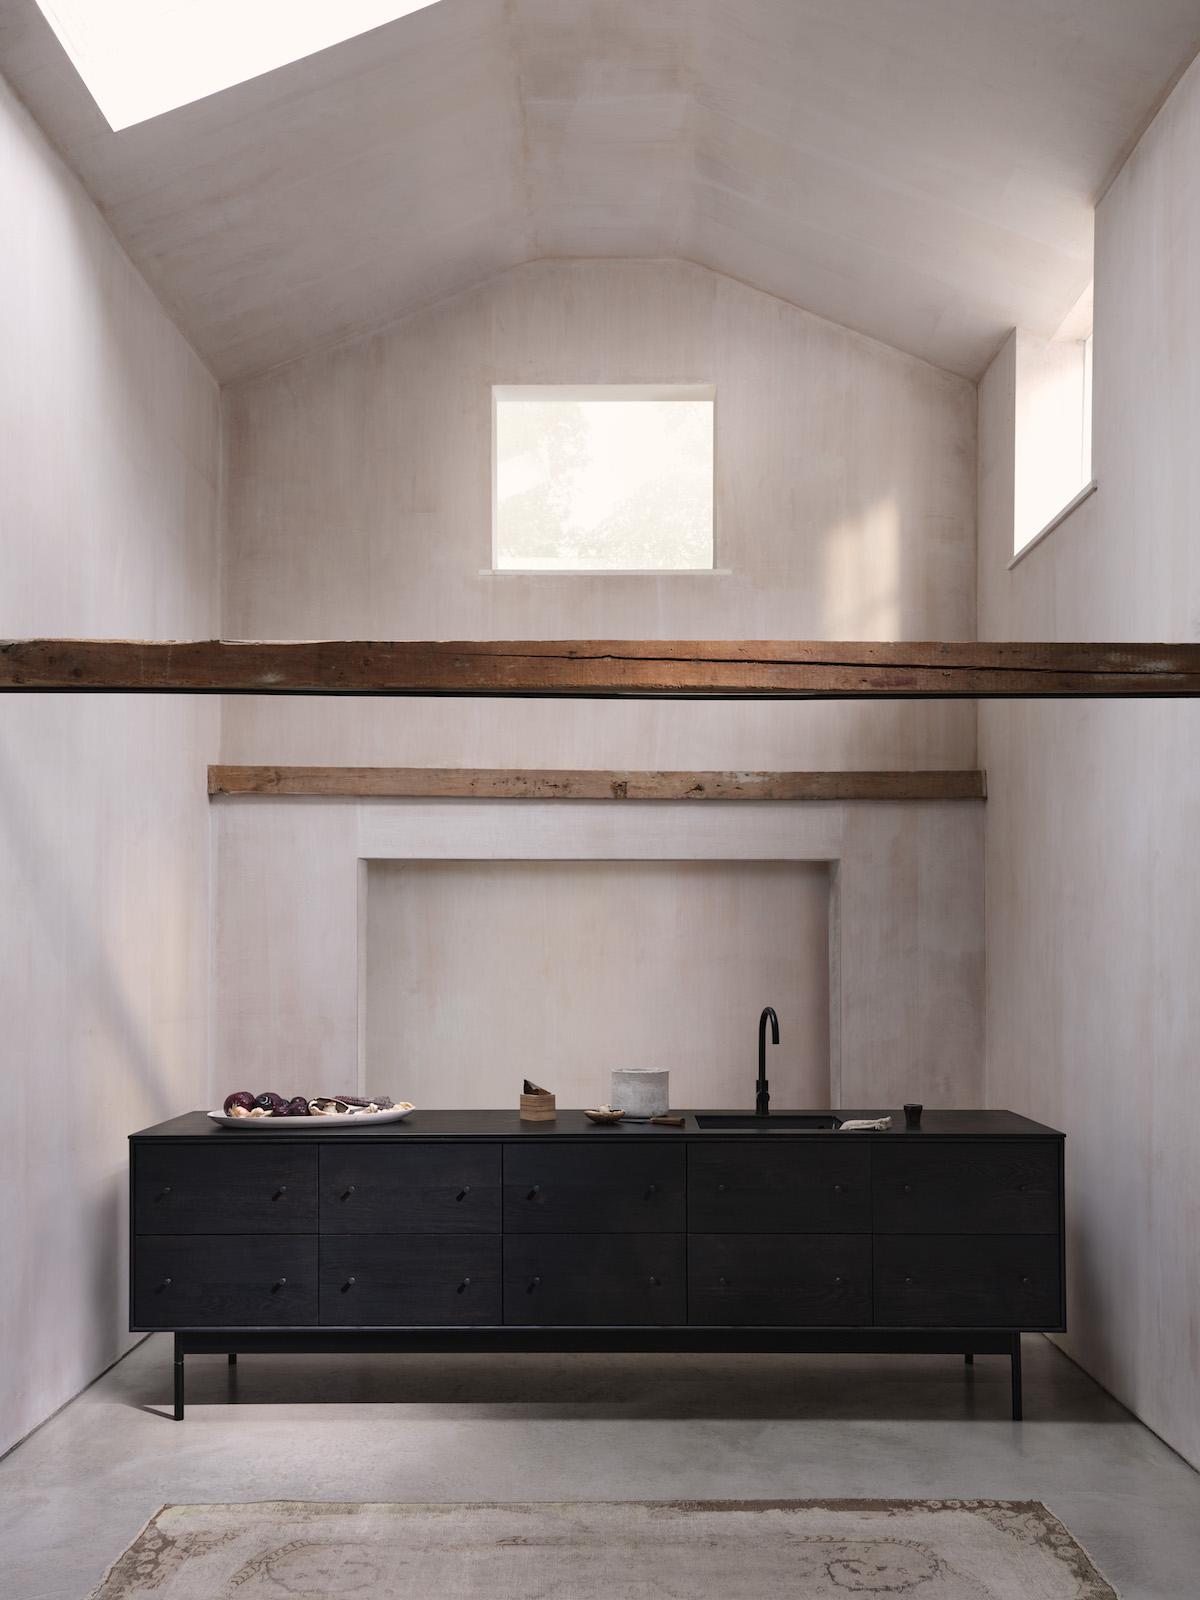 Edward Collinson design studio Black kitchen and white ash Note table